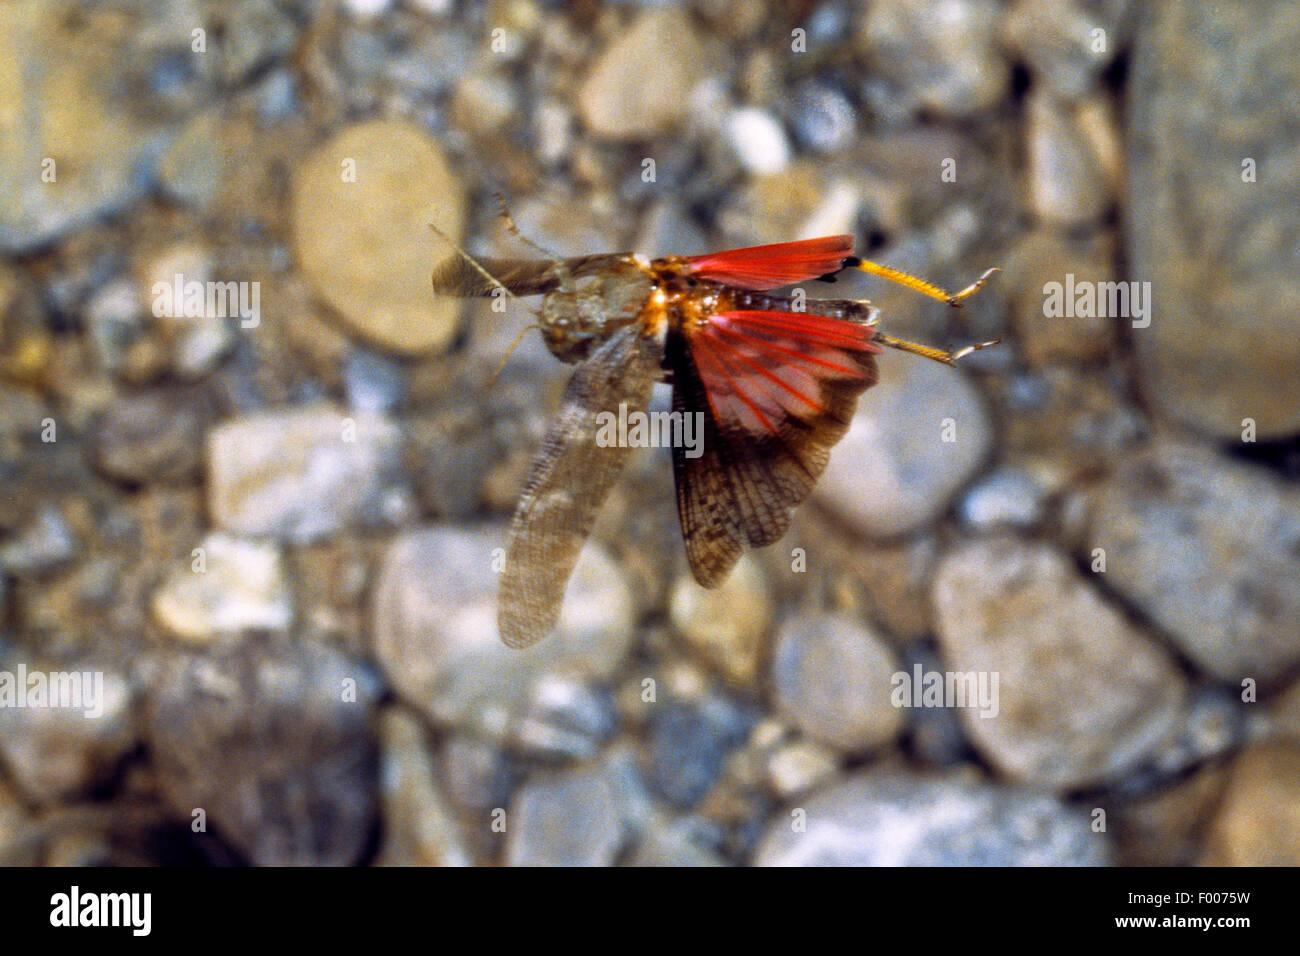 Speckled grasshopper, European Rose-winged Grasshopper  (Bryodema tuberculata, Bryodemella tuberculata), flying - Stock Image